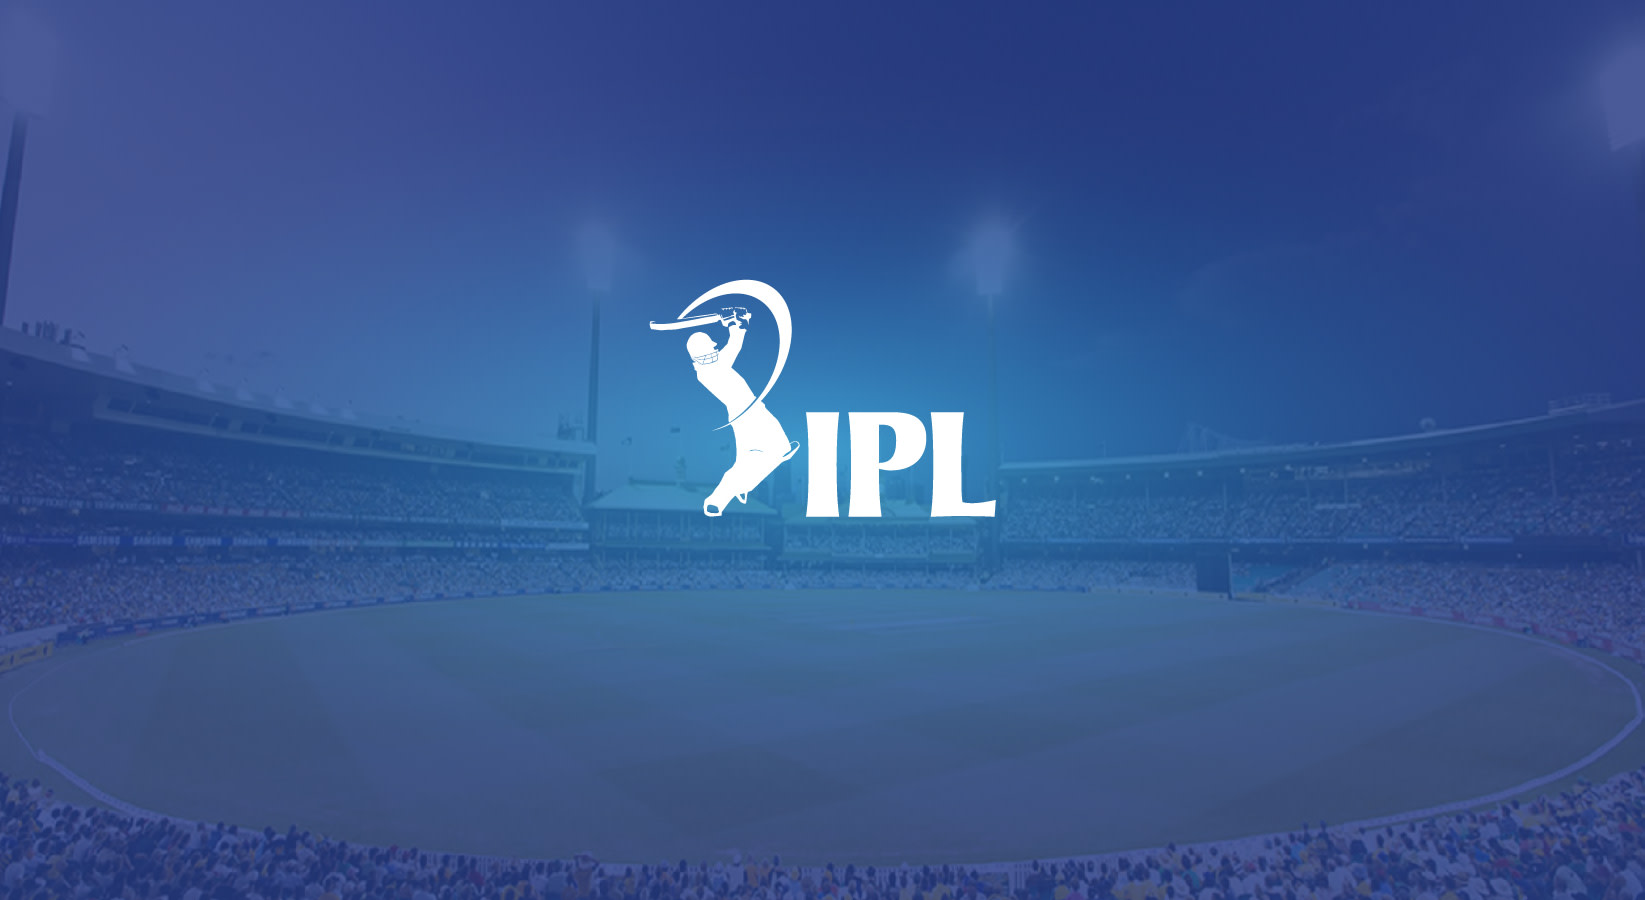 Ipl 7 match in bangalore dating